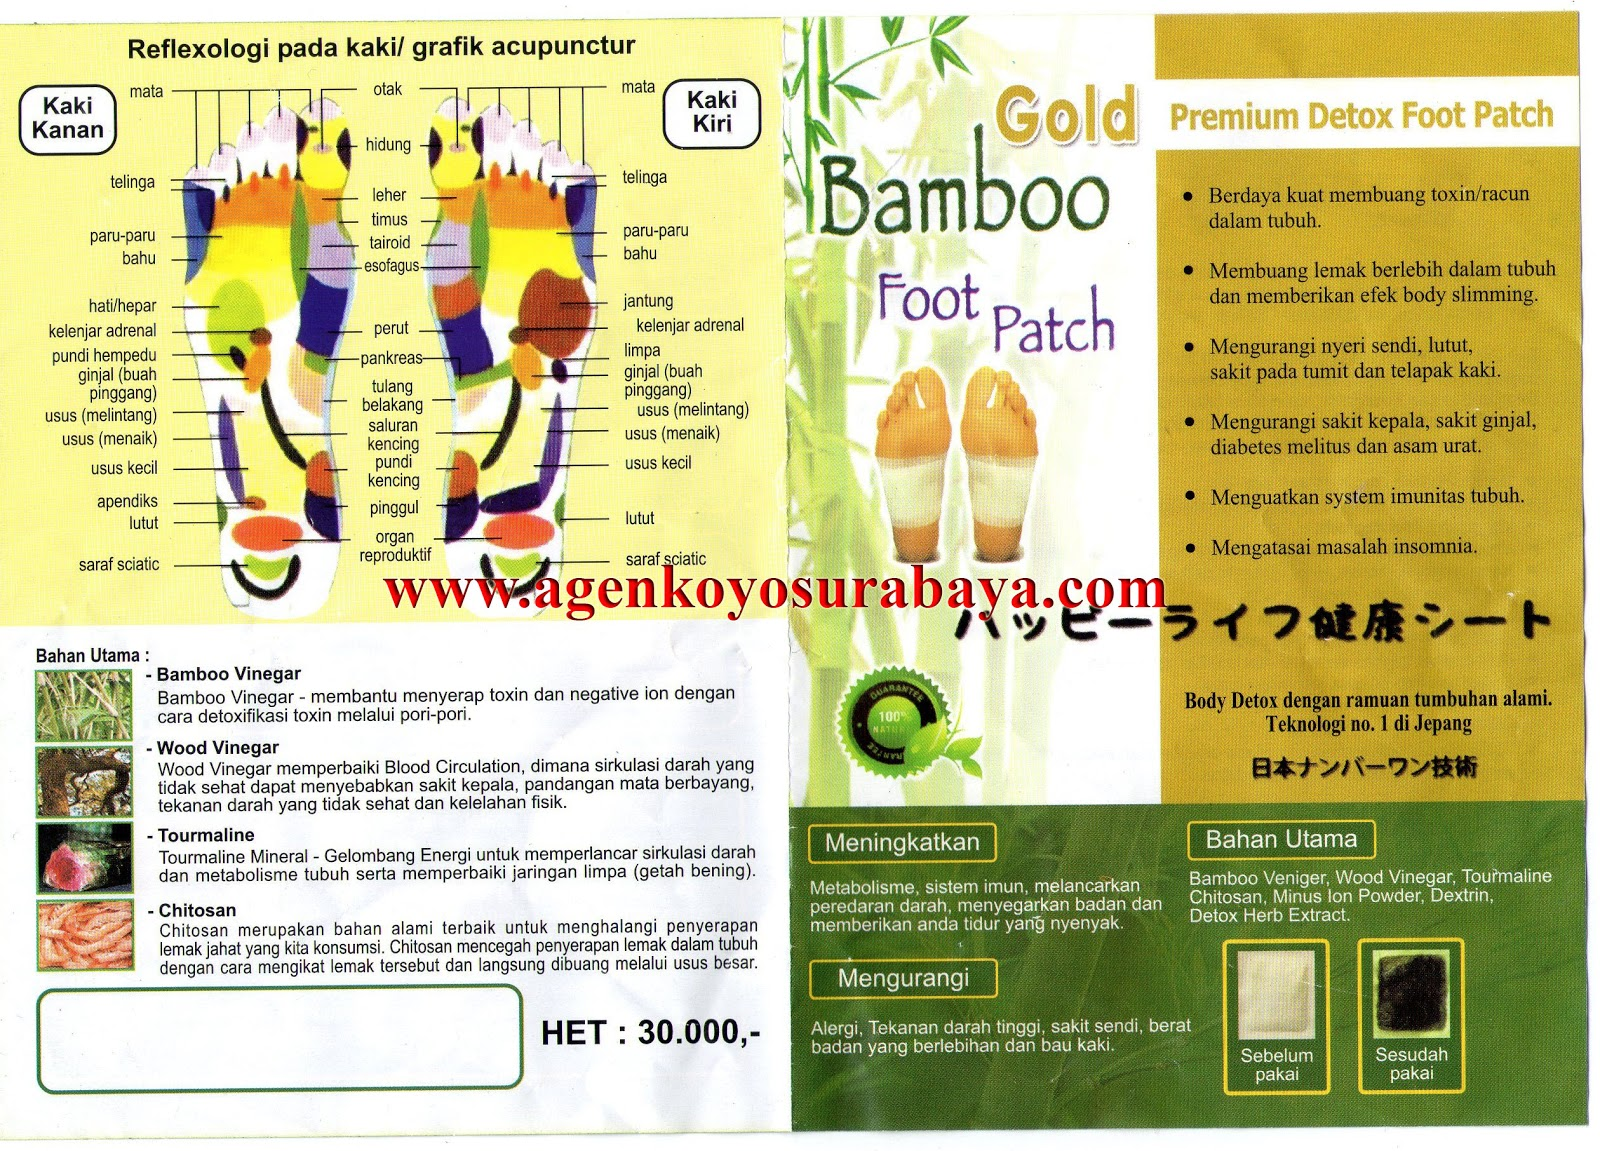 Harga Dan Spesifikasi Koyo Kaki Bamboo Gold Foot Patch Bambo Detox Kesehatan Agen Surabaya Happy Life Jual Manfaat